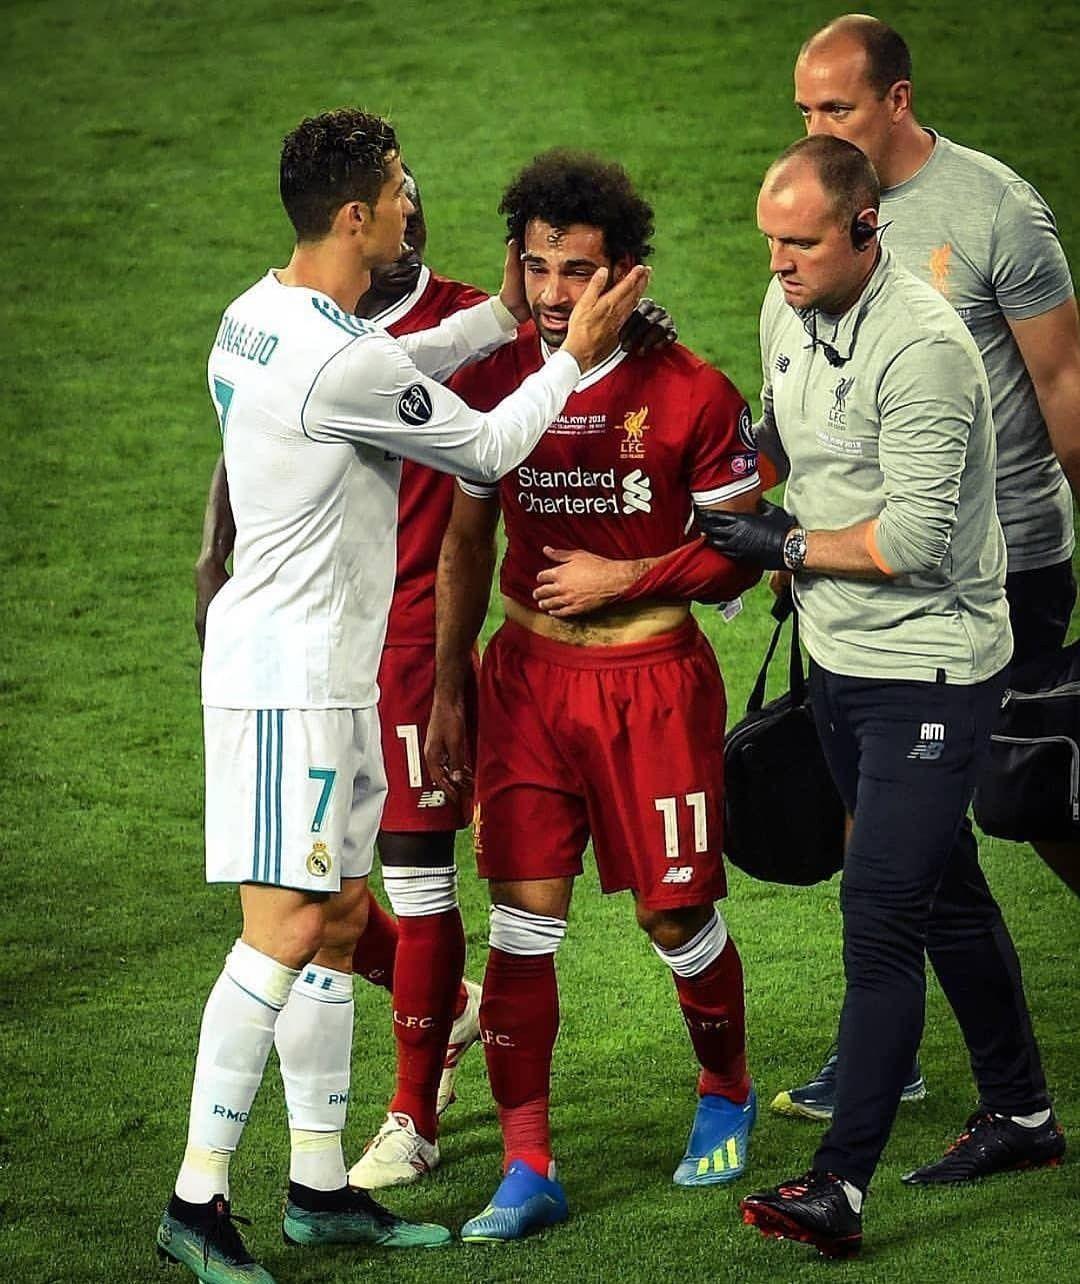 Respect Uefa Champions League Ronaldo Football Cristiano Ronaldo